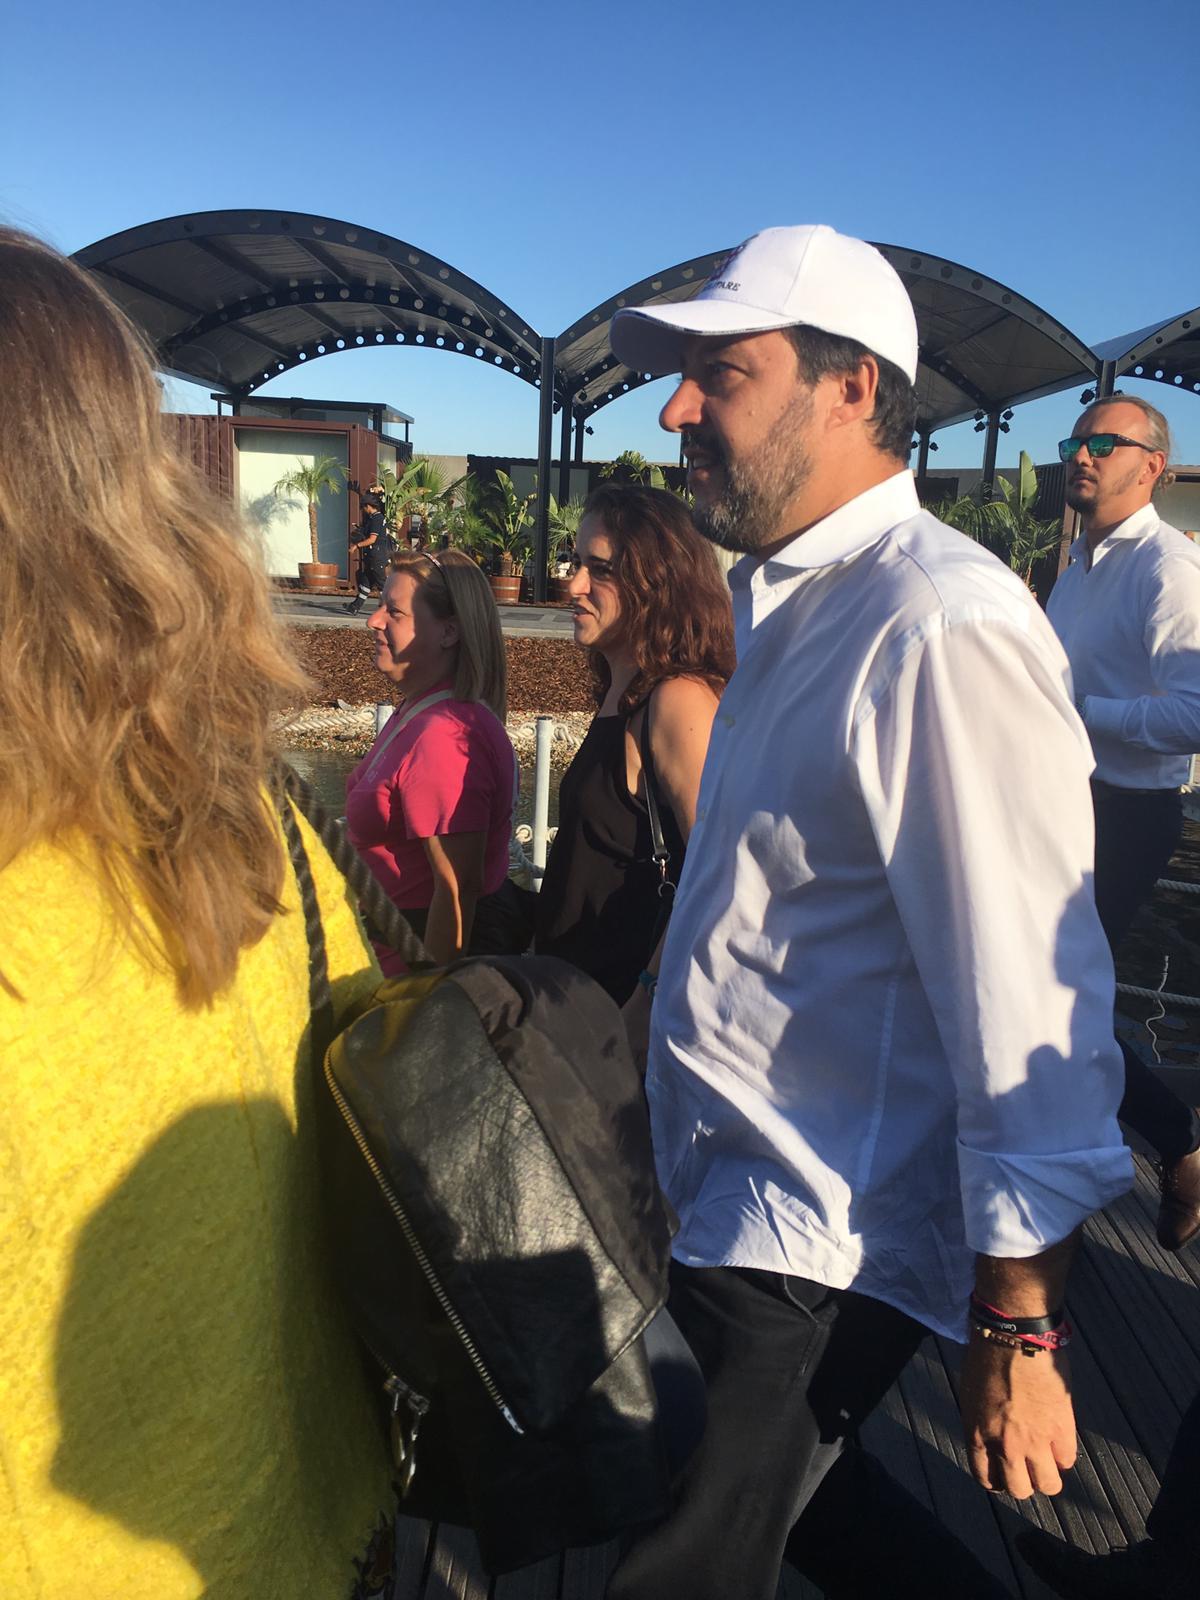 Matteo Salvini al Salone nautico Genova 2019 Fotoflashteam reporter